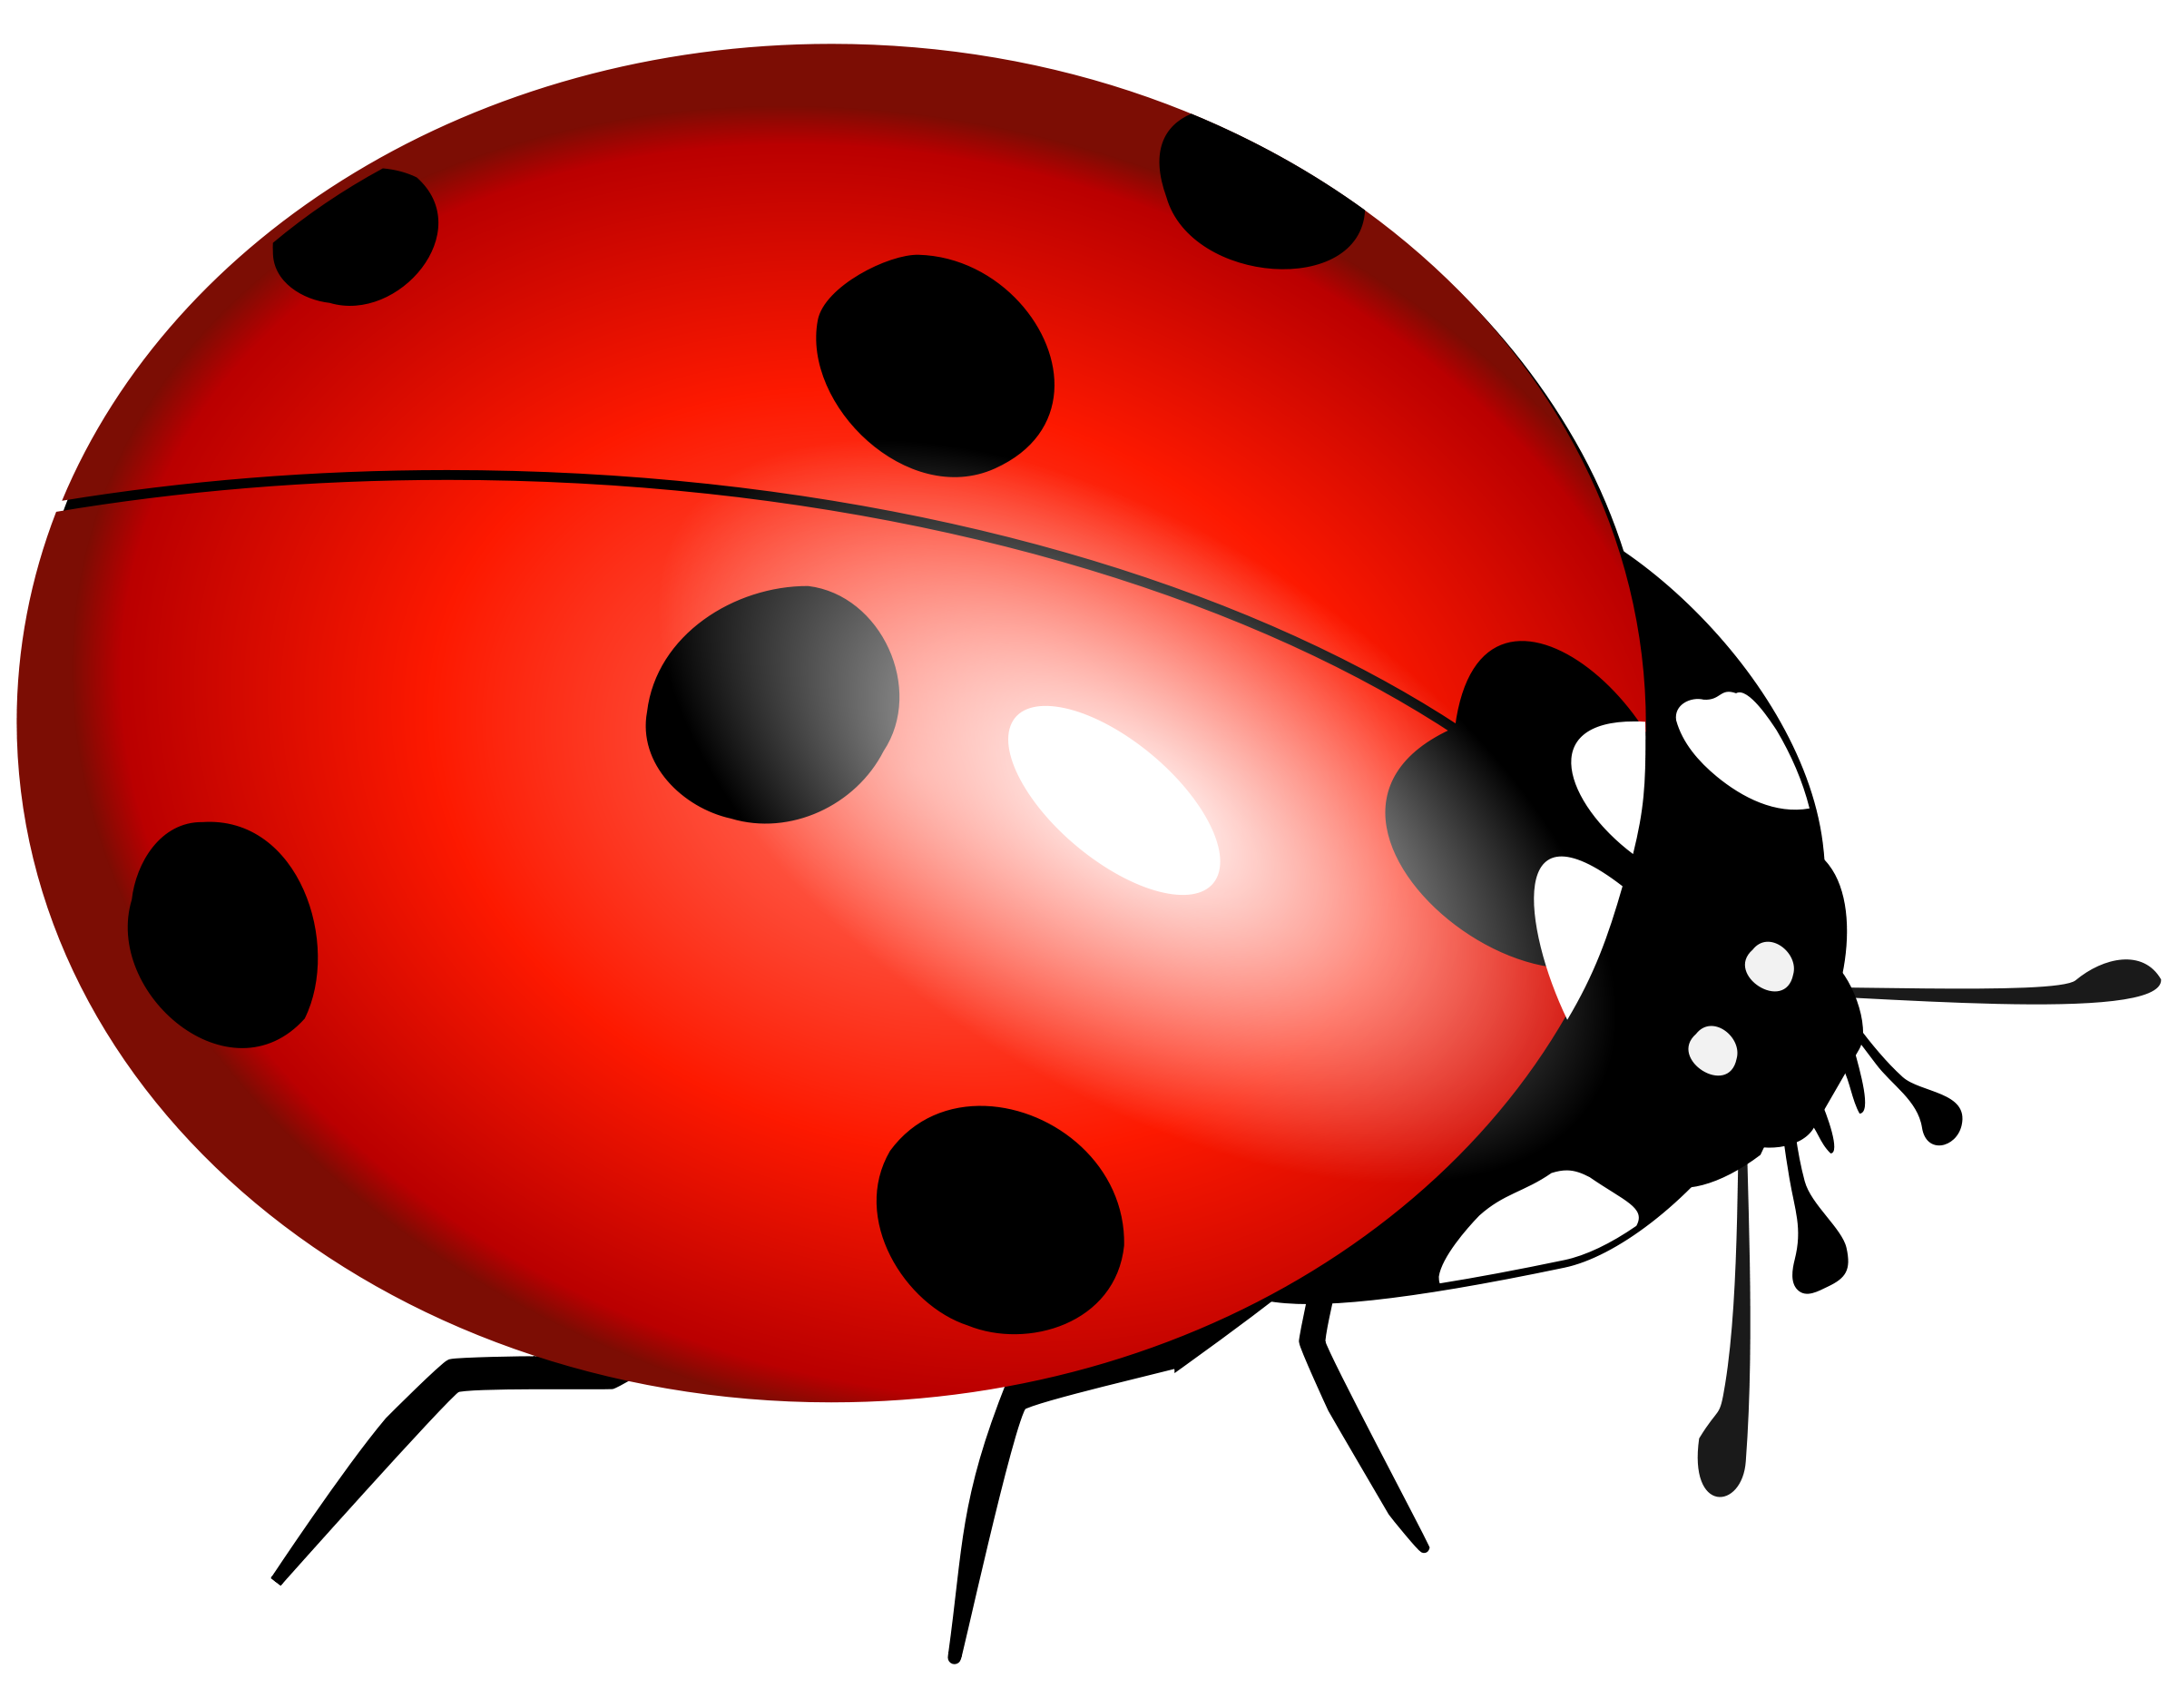 Insect clipart melonheadz. Ladybug file transparentpng